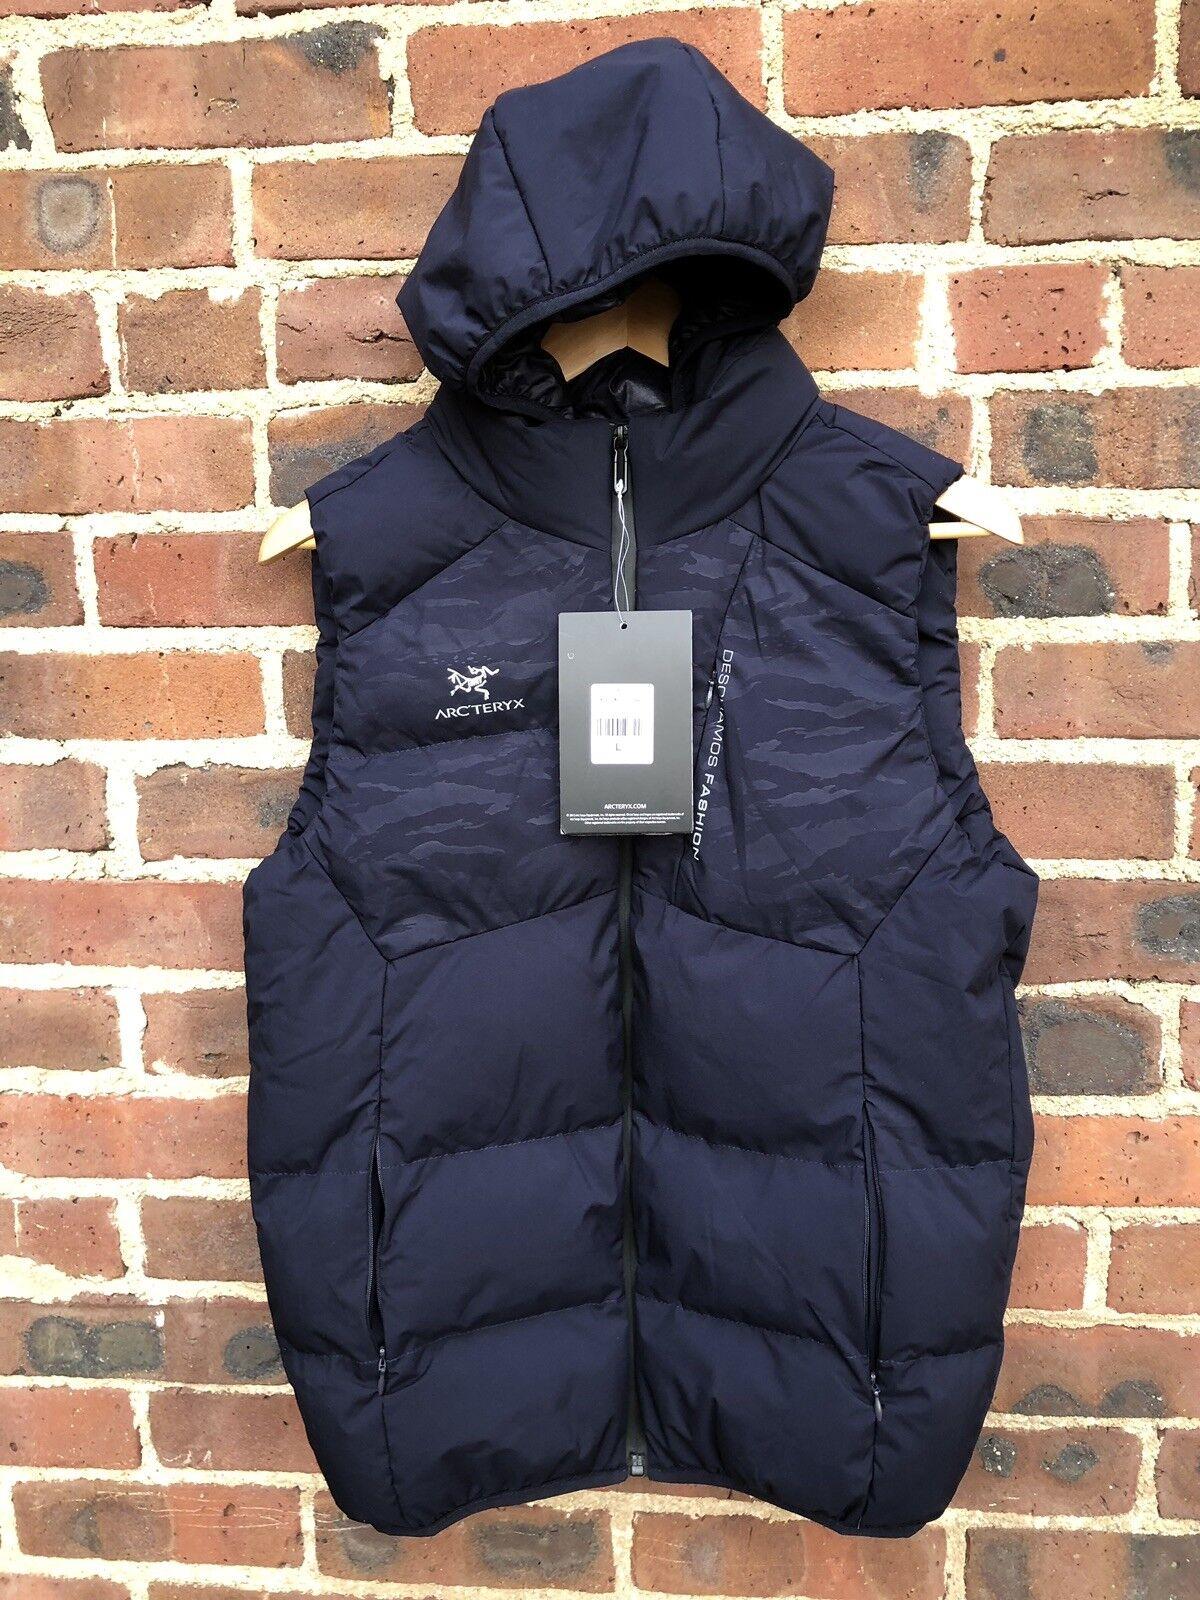 Arc'teryx  Women's  Puffy Vest  OSCILLATOR Series Size L  amazing colorways